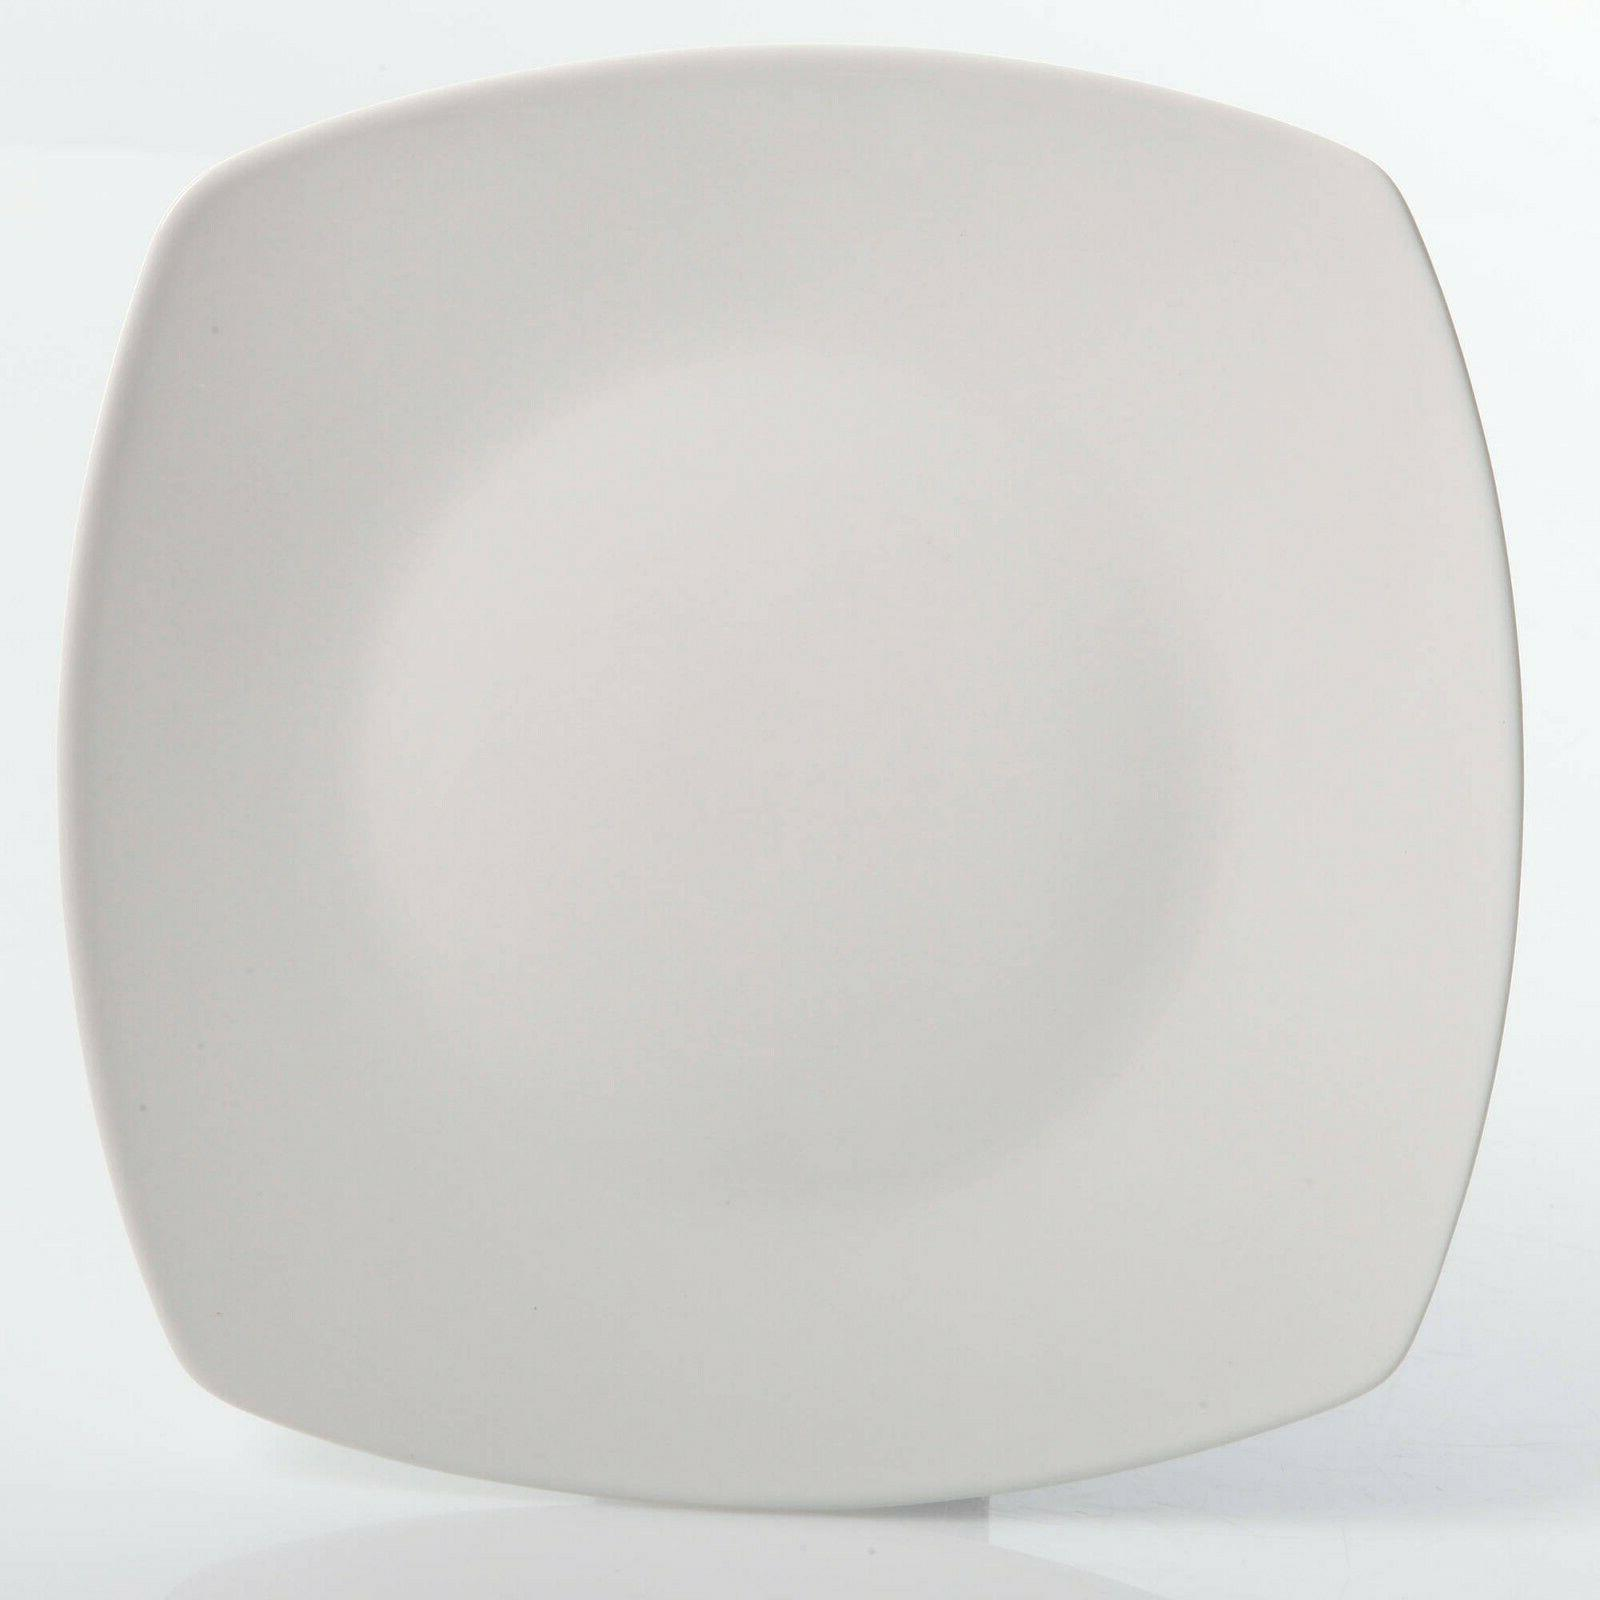 30-Piece Porcelain Square Dinner Service